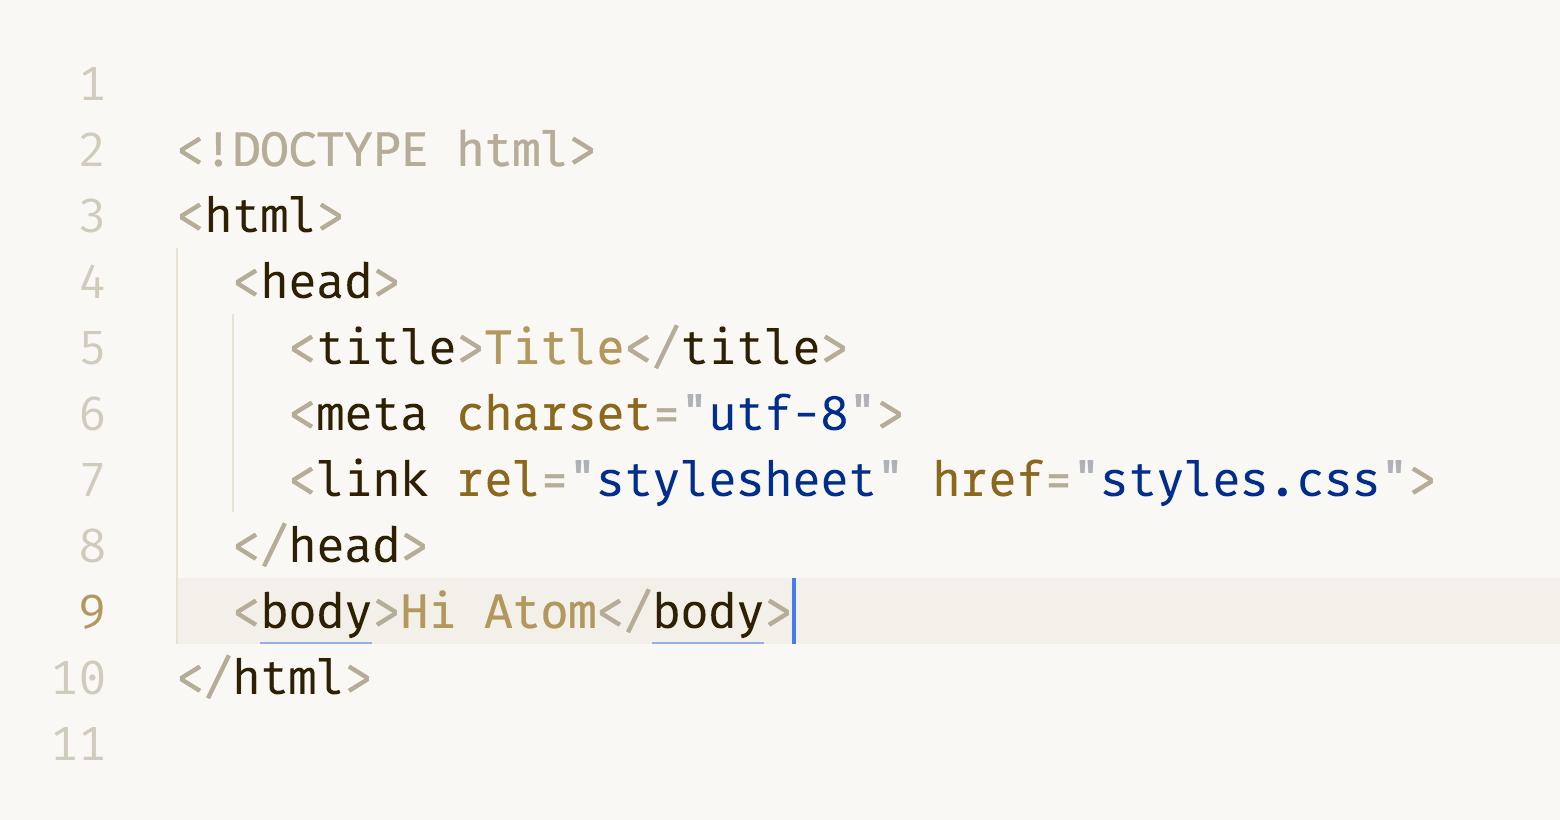 HTML in DuoTone light